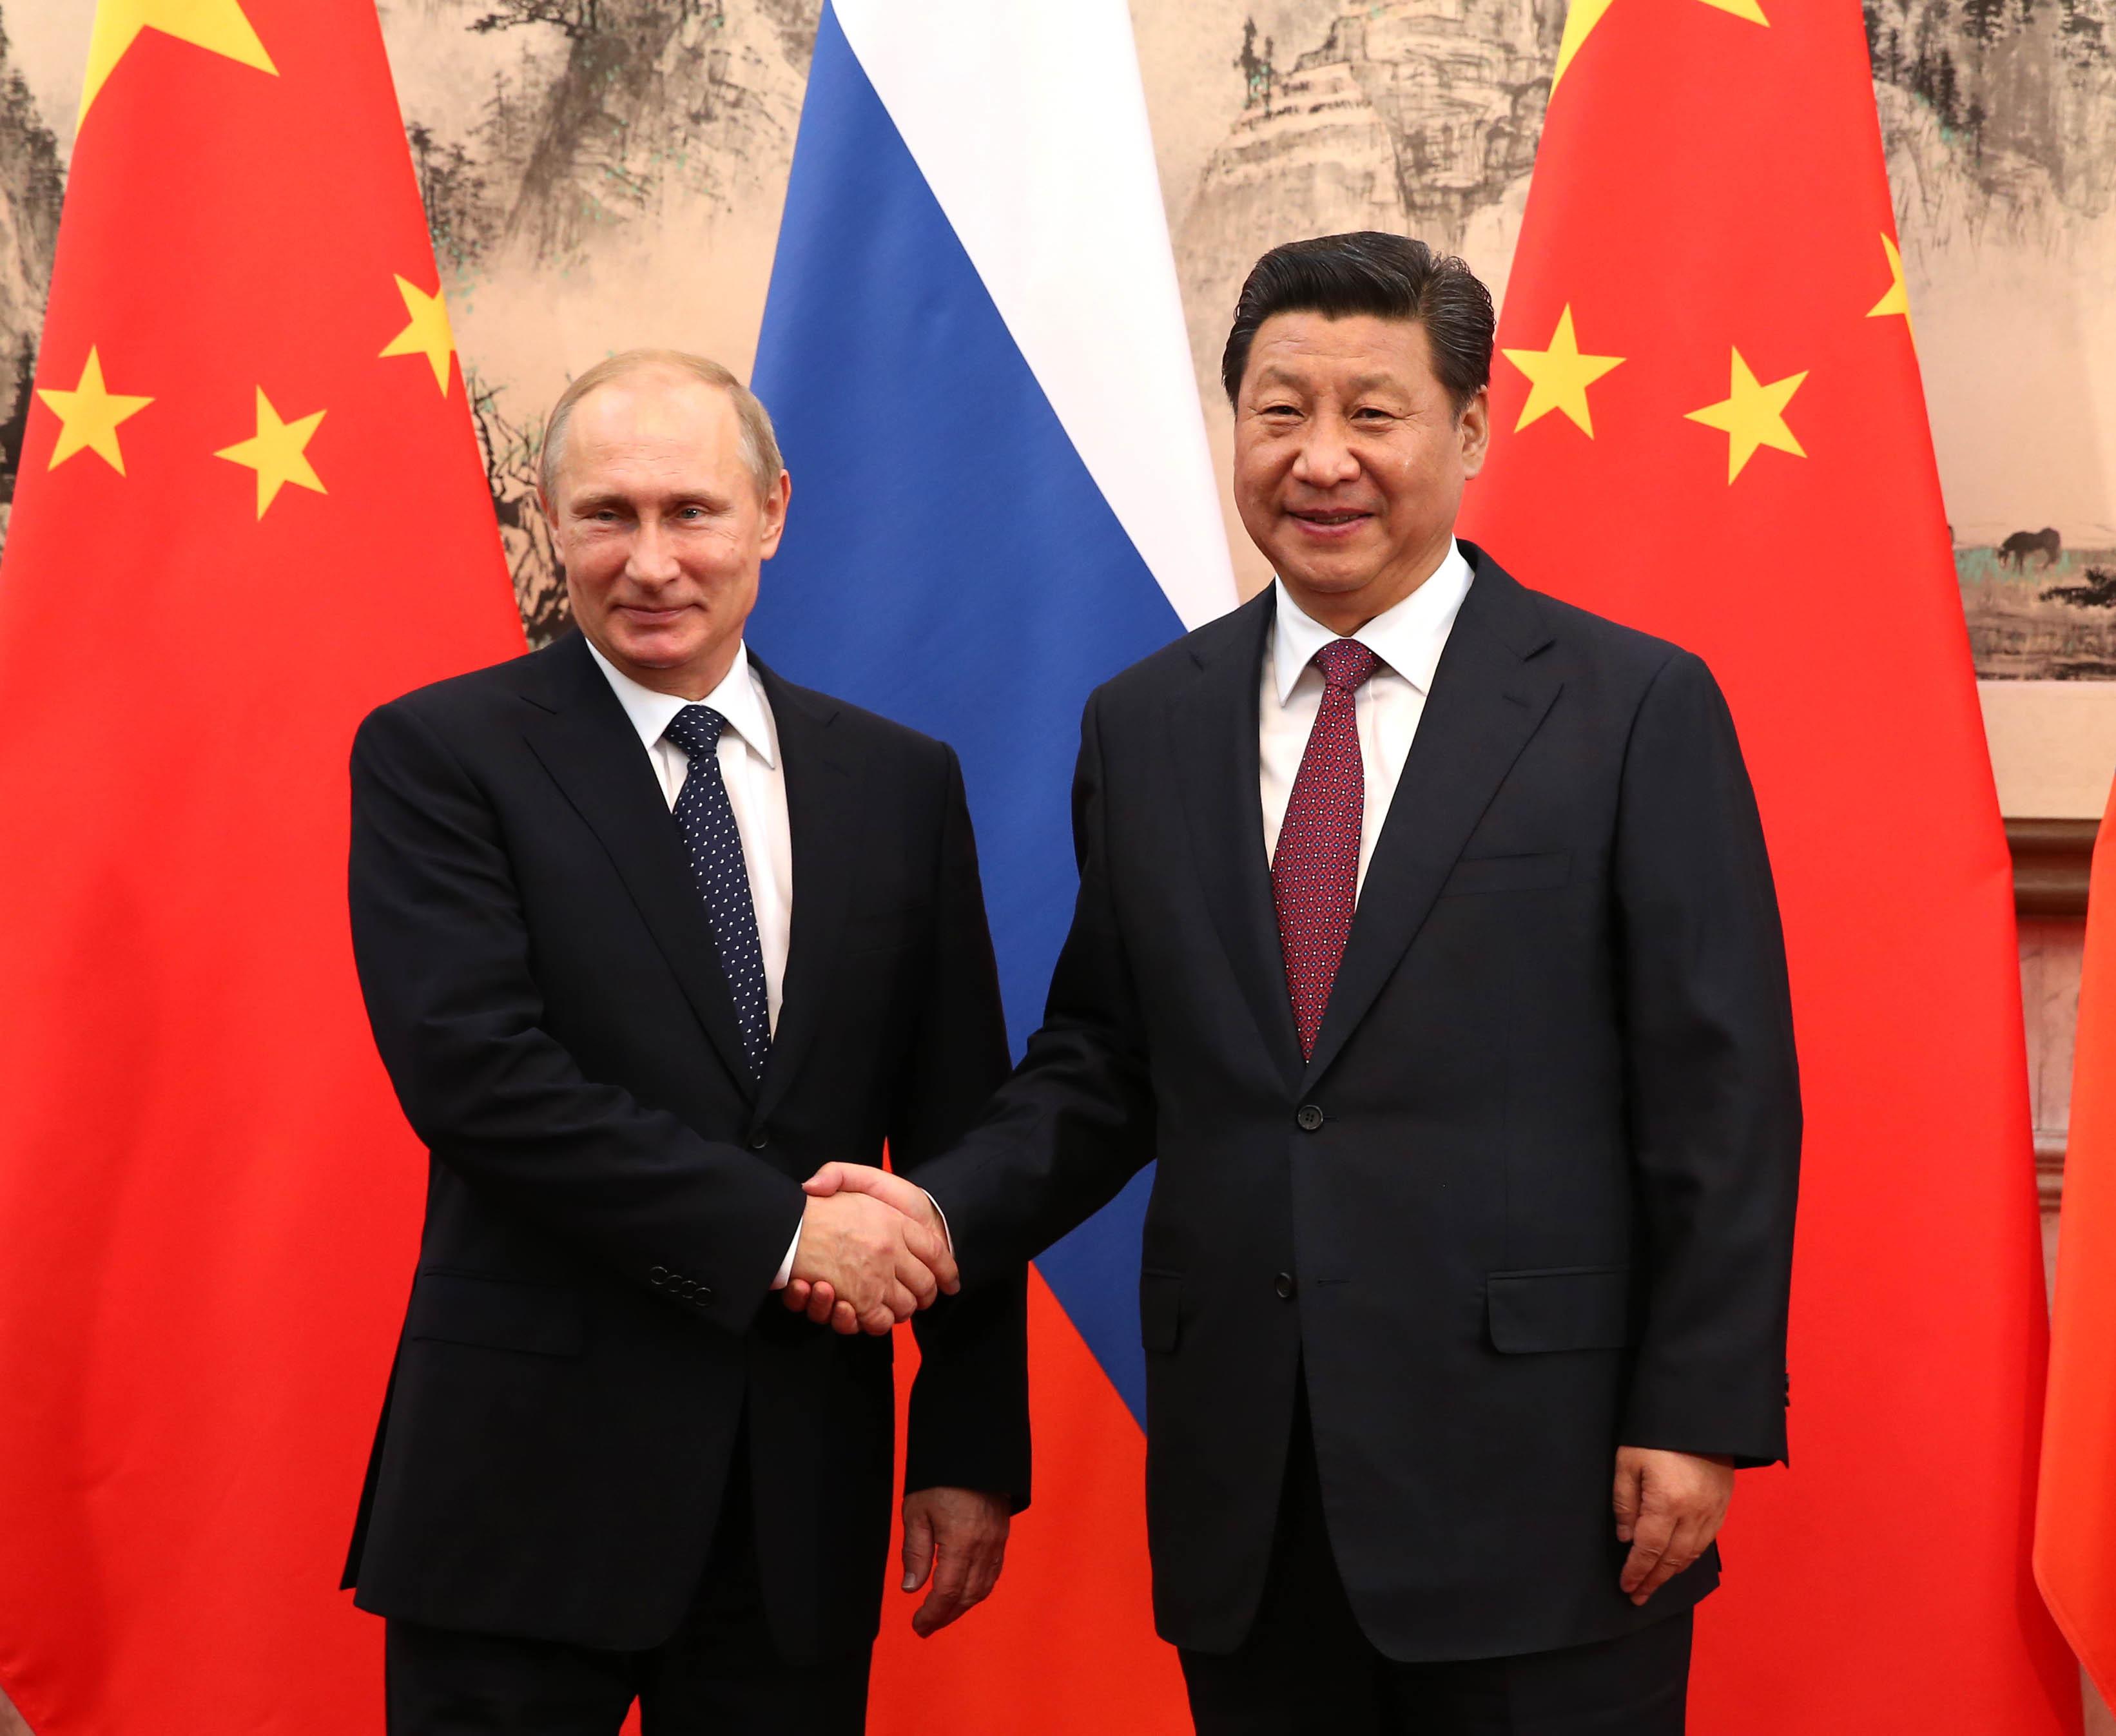 Президент РФ встретился с лидером КНР. Итоги встречи